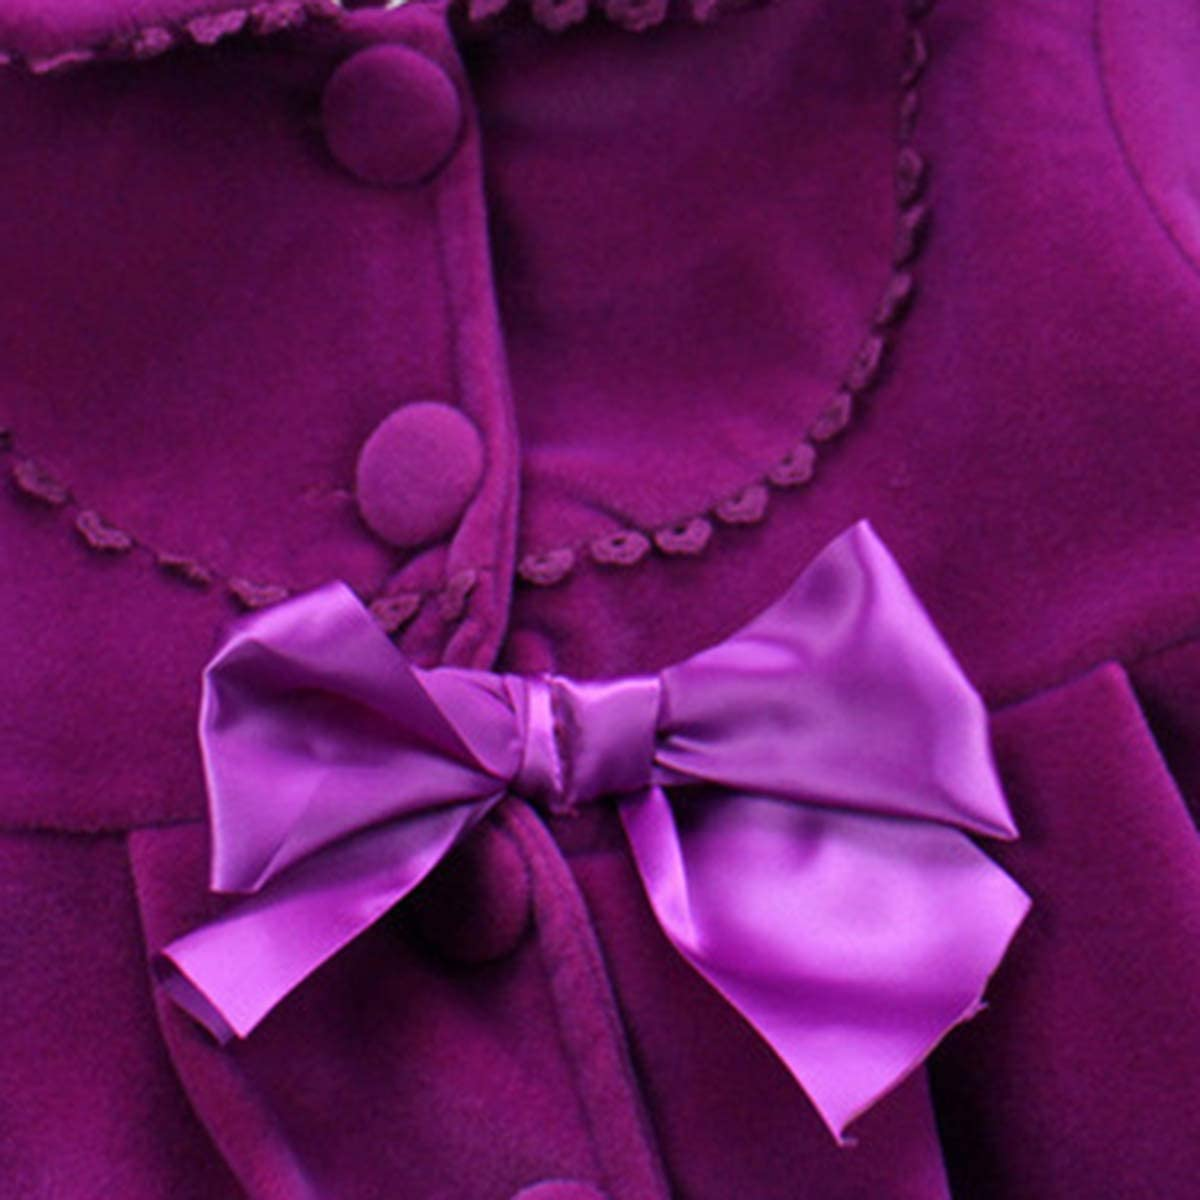 2-7T Toddler Girls Trench Coat Windbreaker Winter Warm Jacket Overcoat Cloak